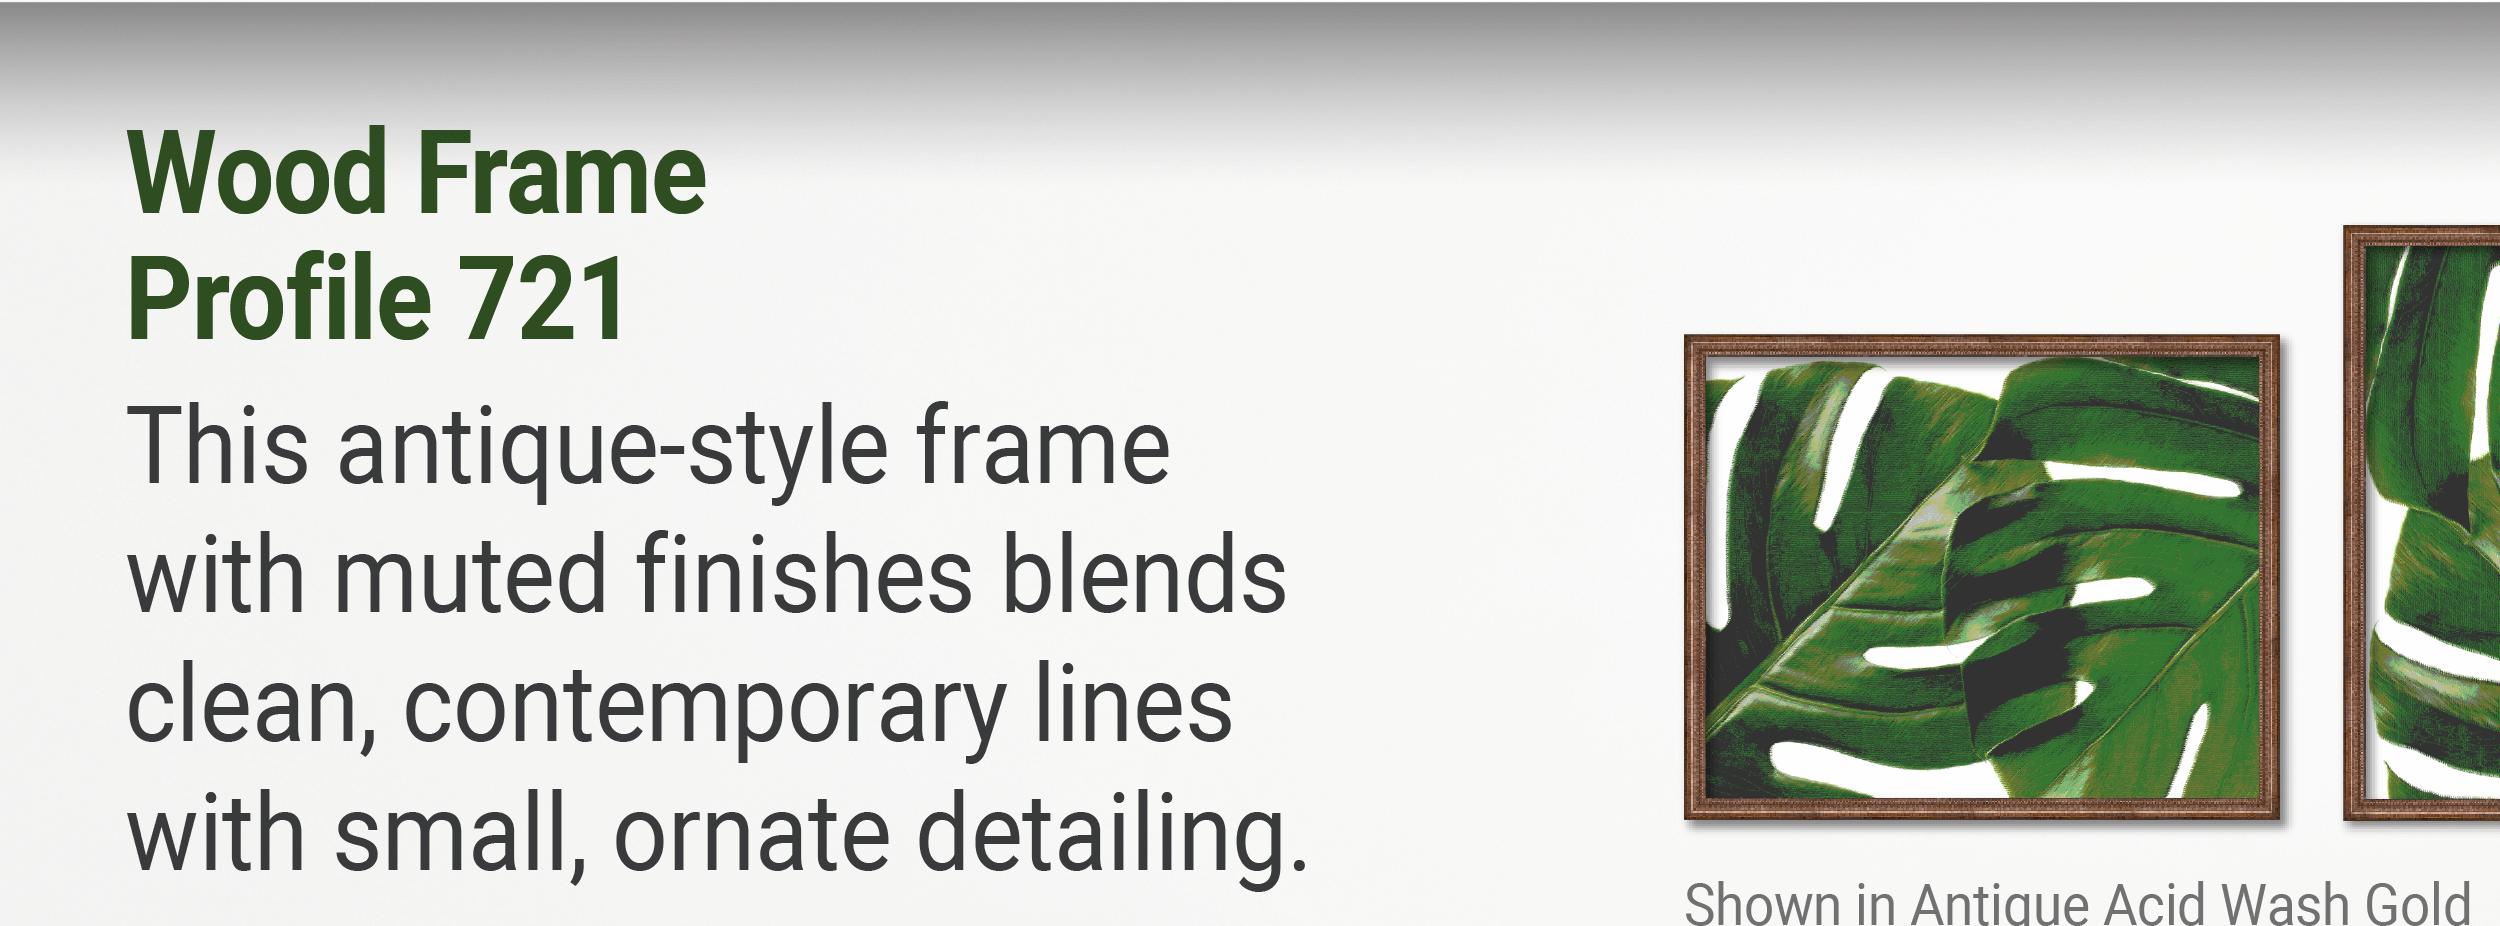 Wood Frame Profile 721